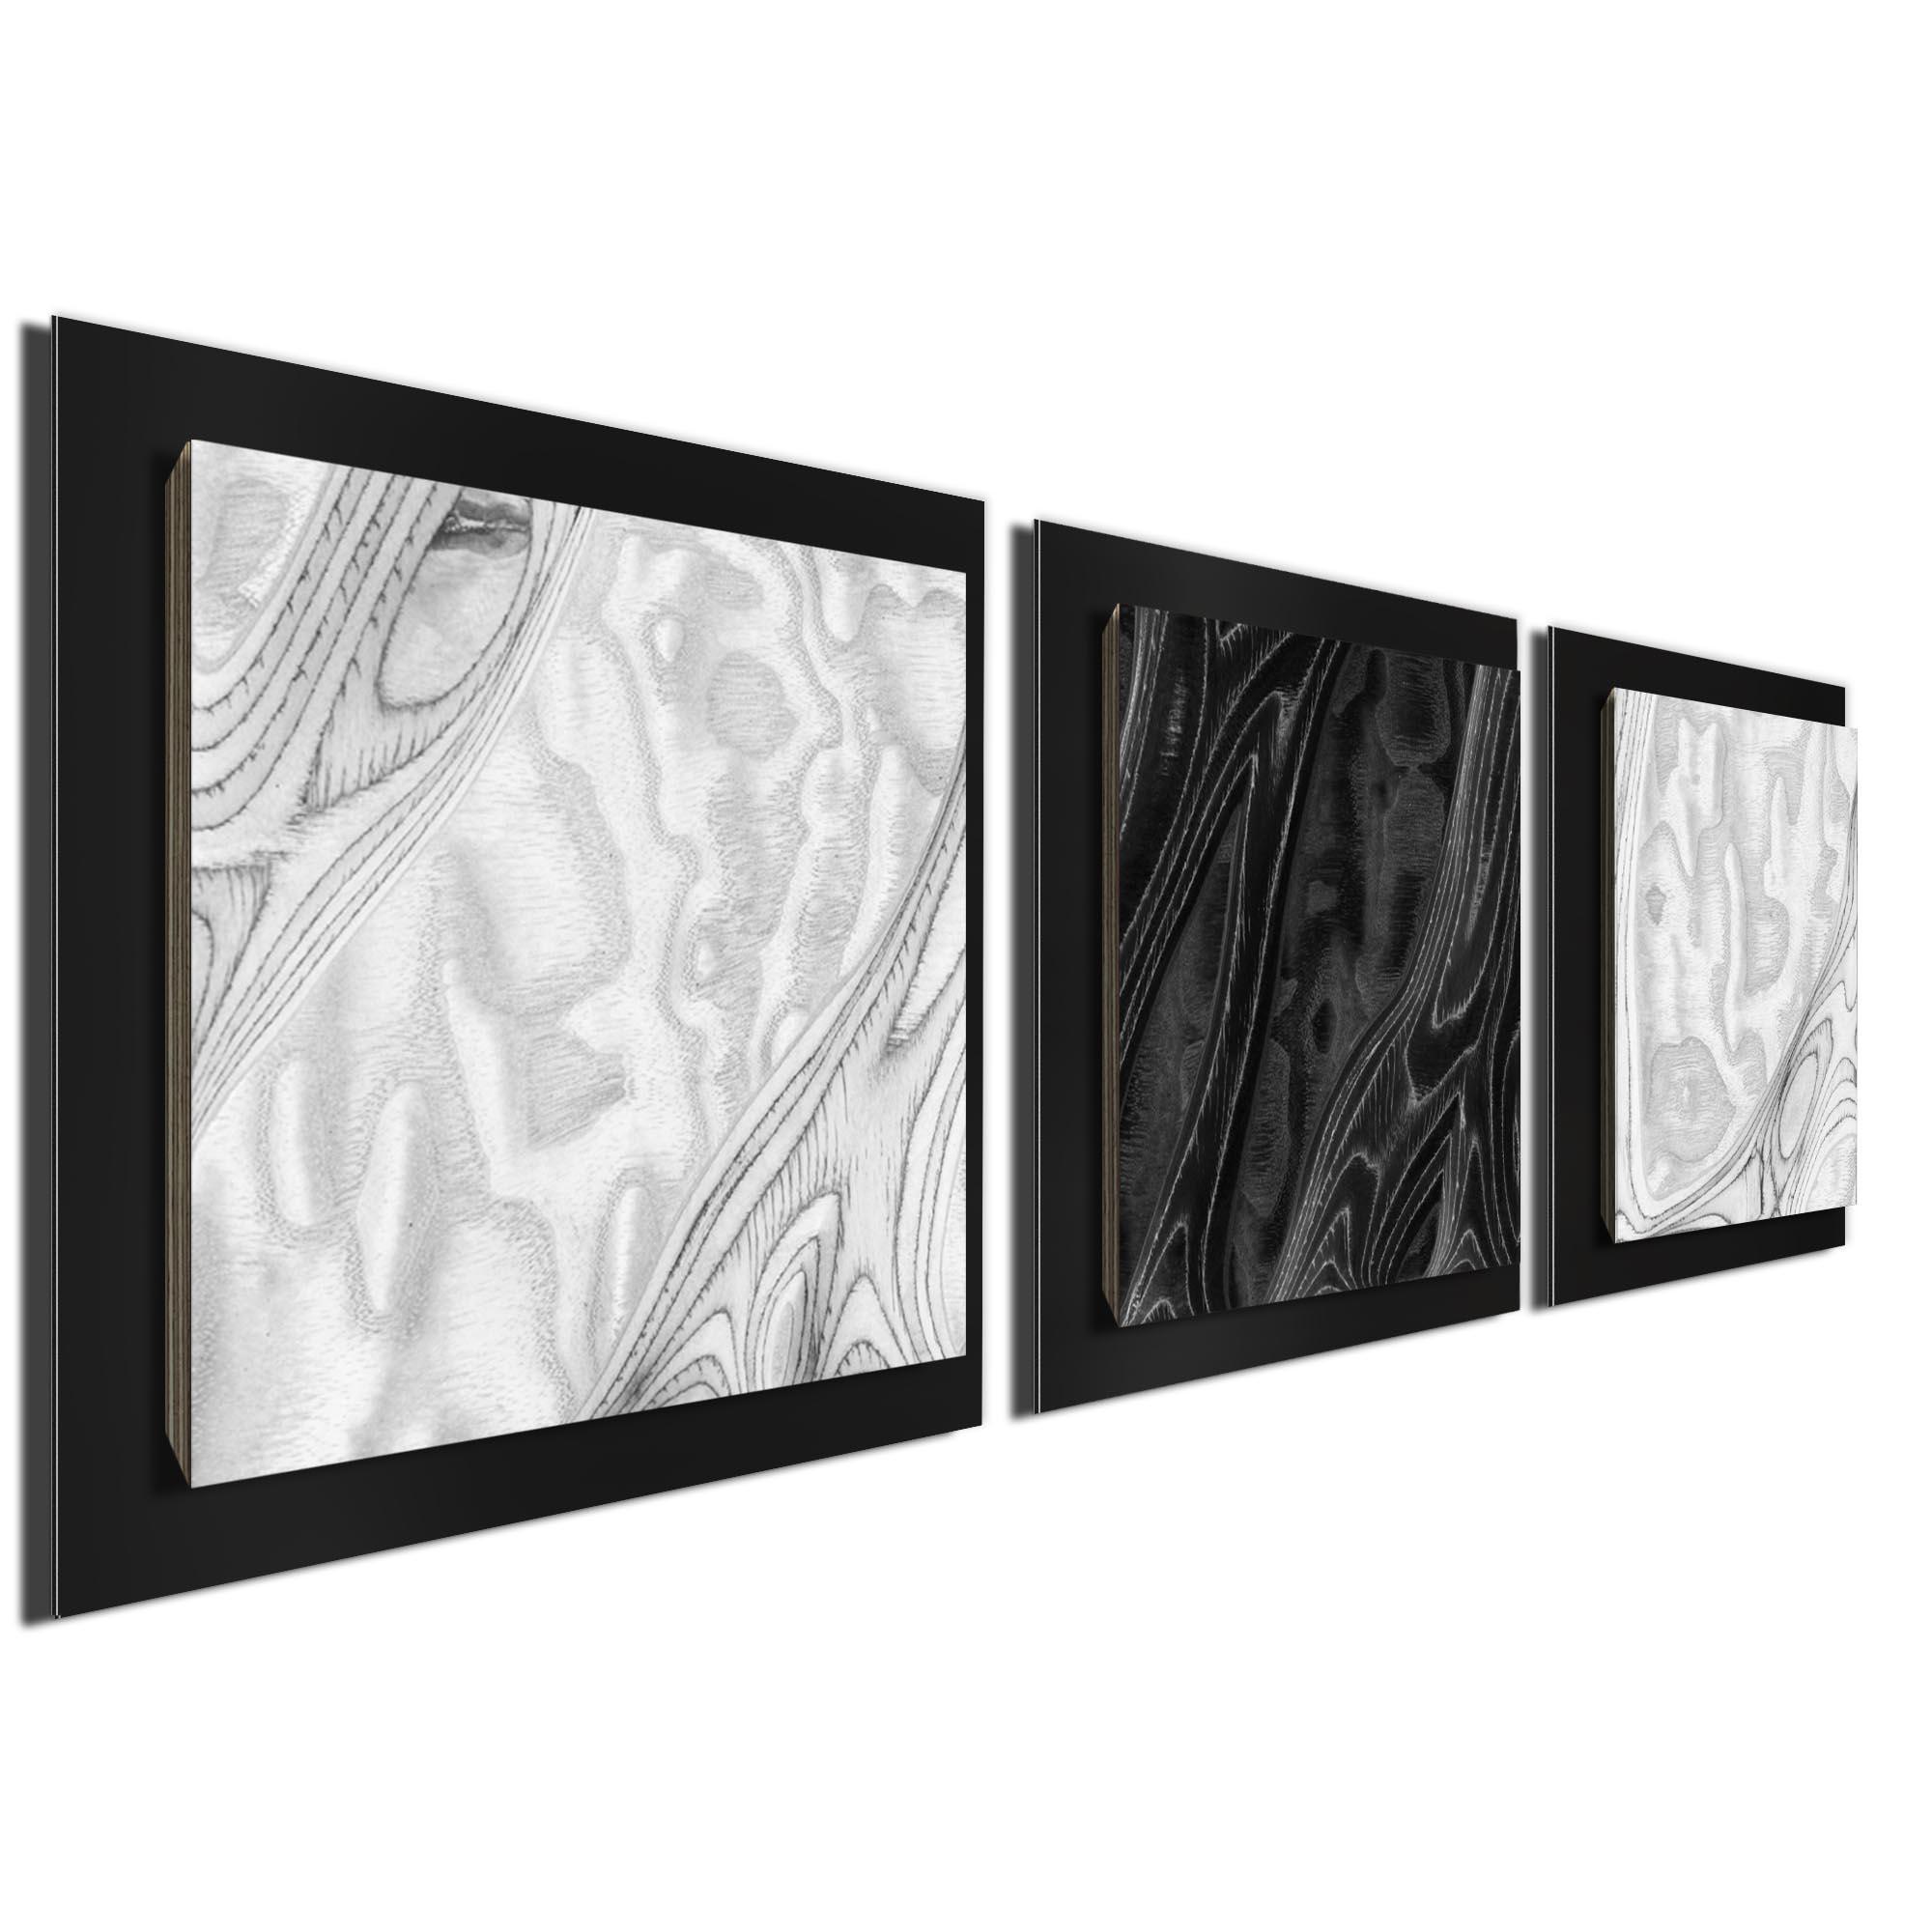 WBW Burl Essence Black by Jackson Wright Rustic Modern Style Wood Wall Art - Image 2